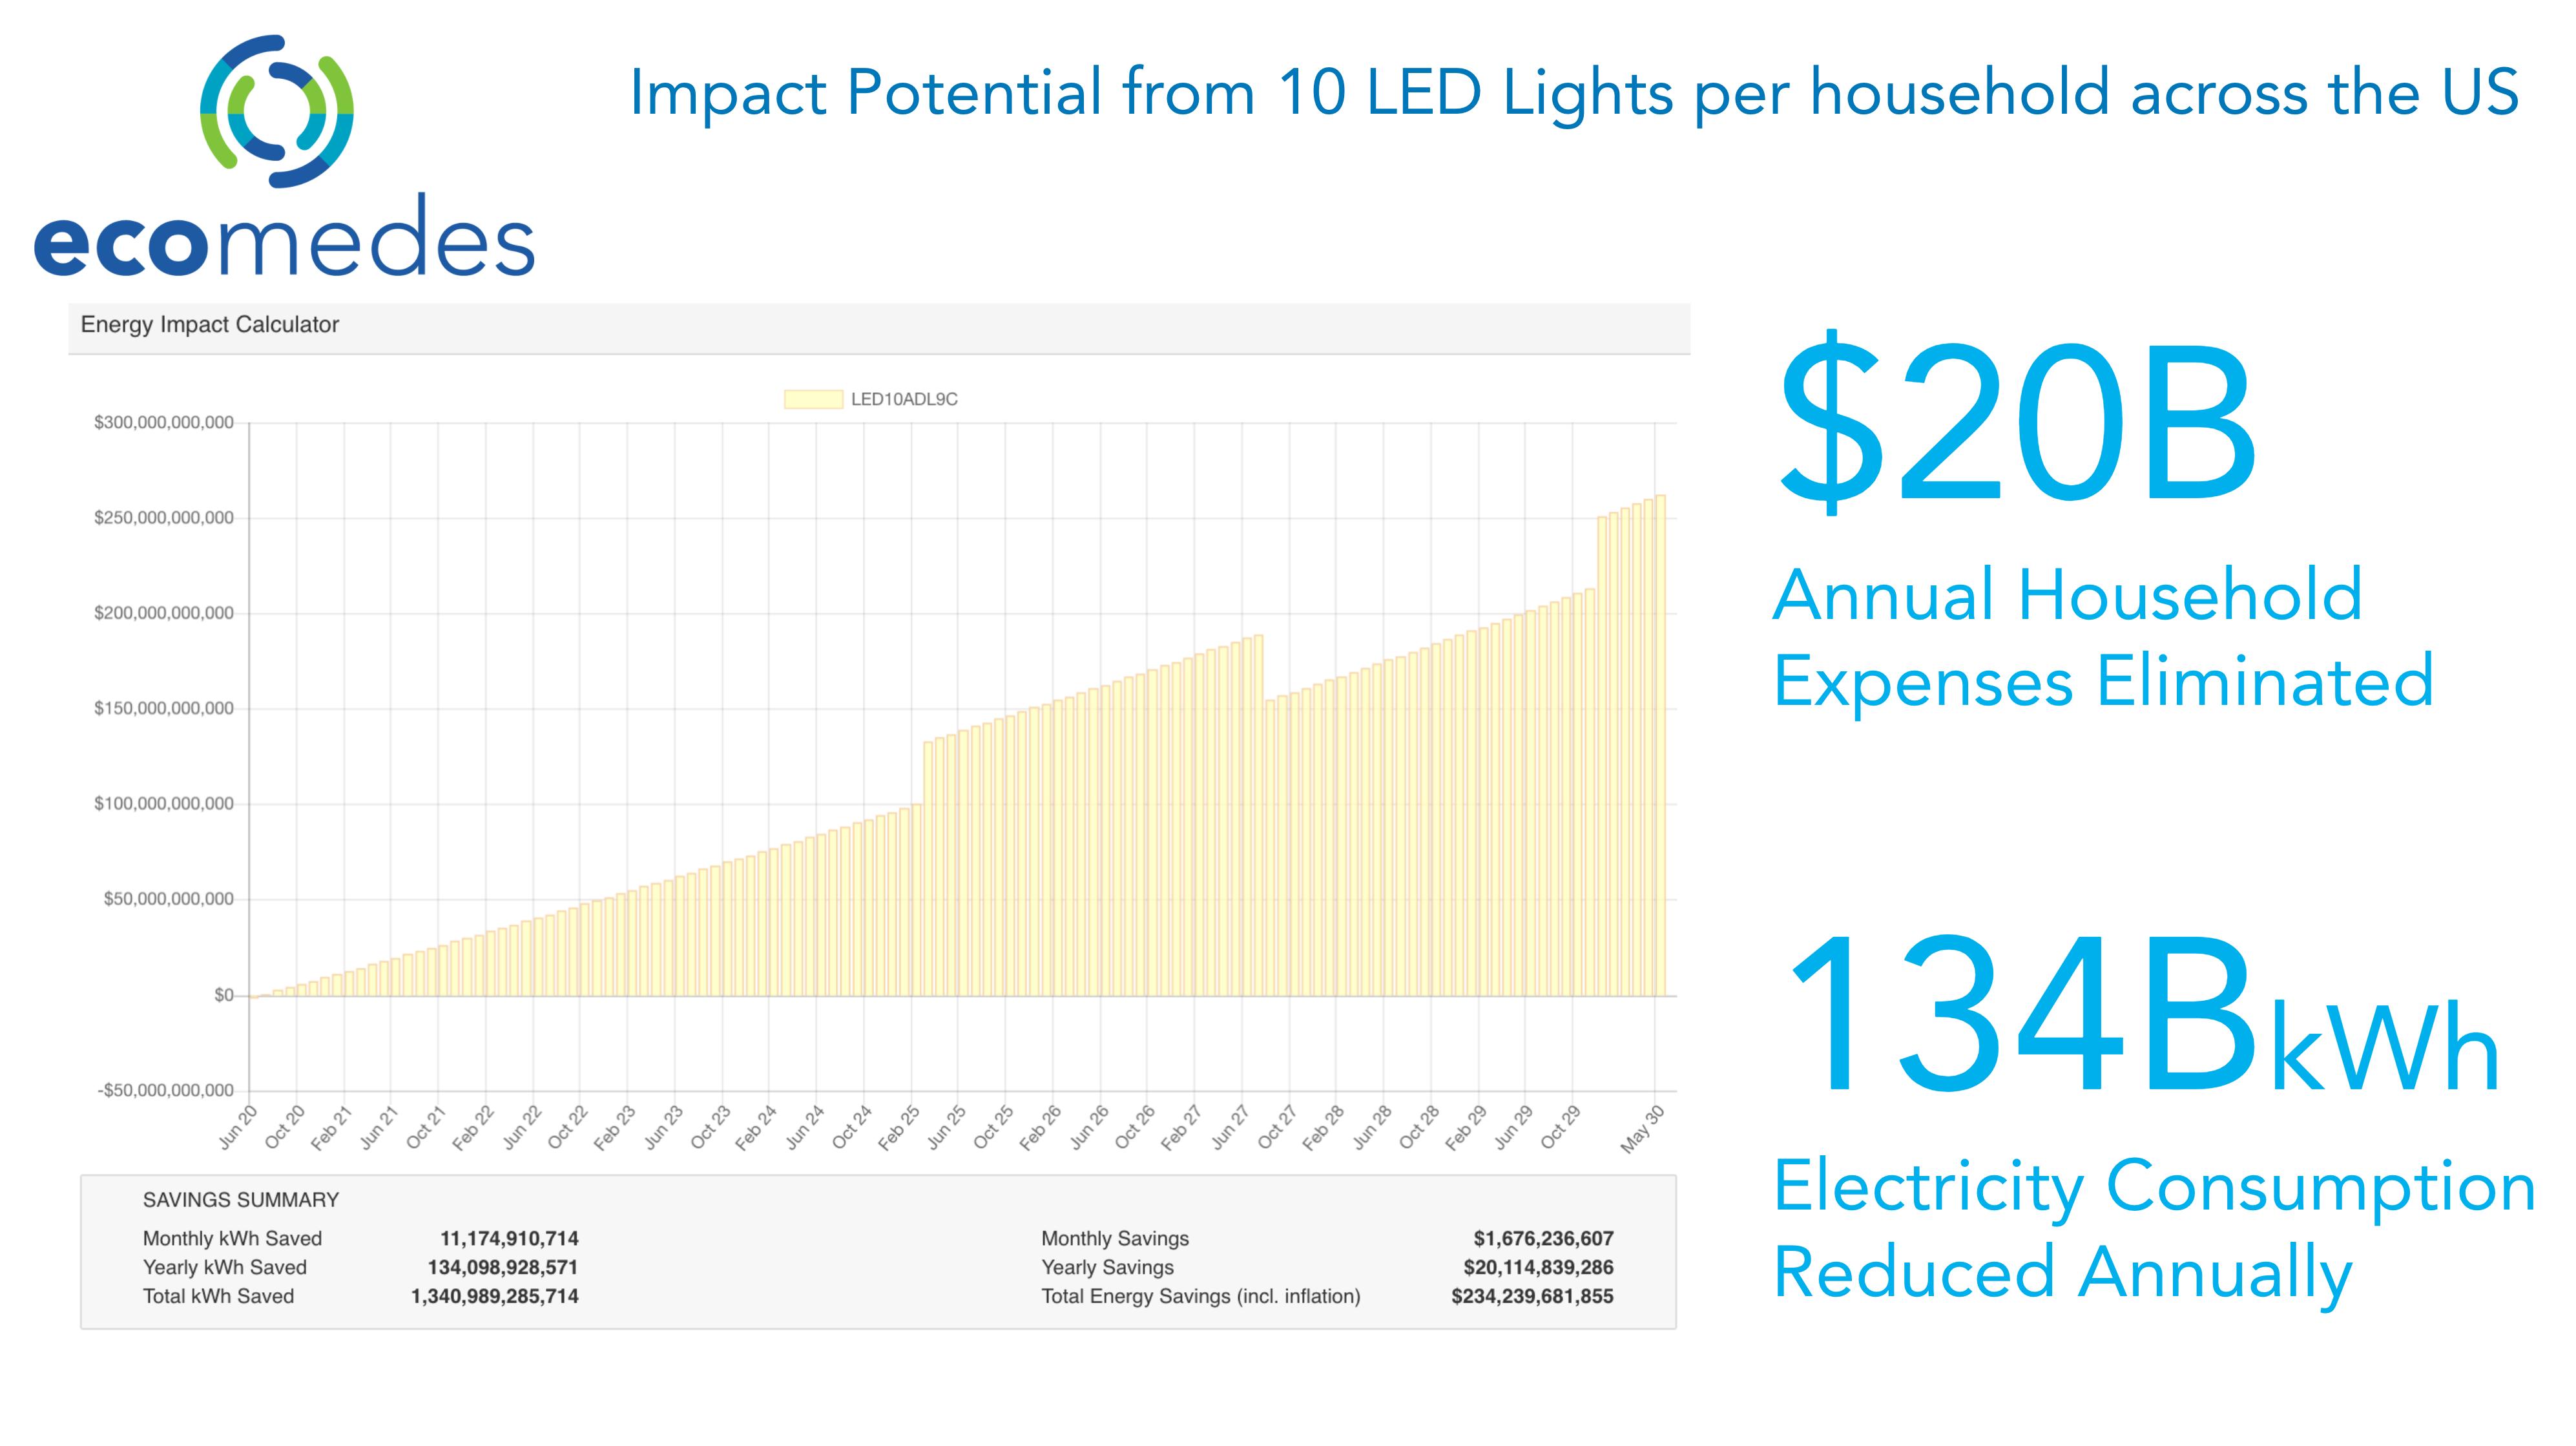 ecomedes Top 10 LED Light Bulbs